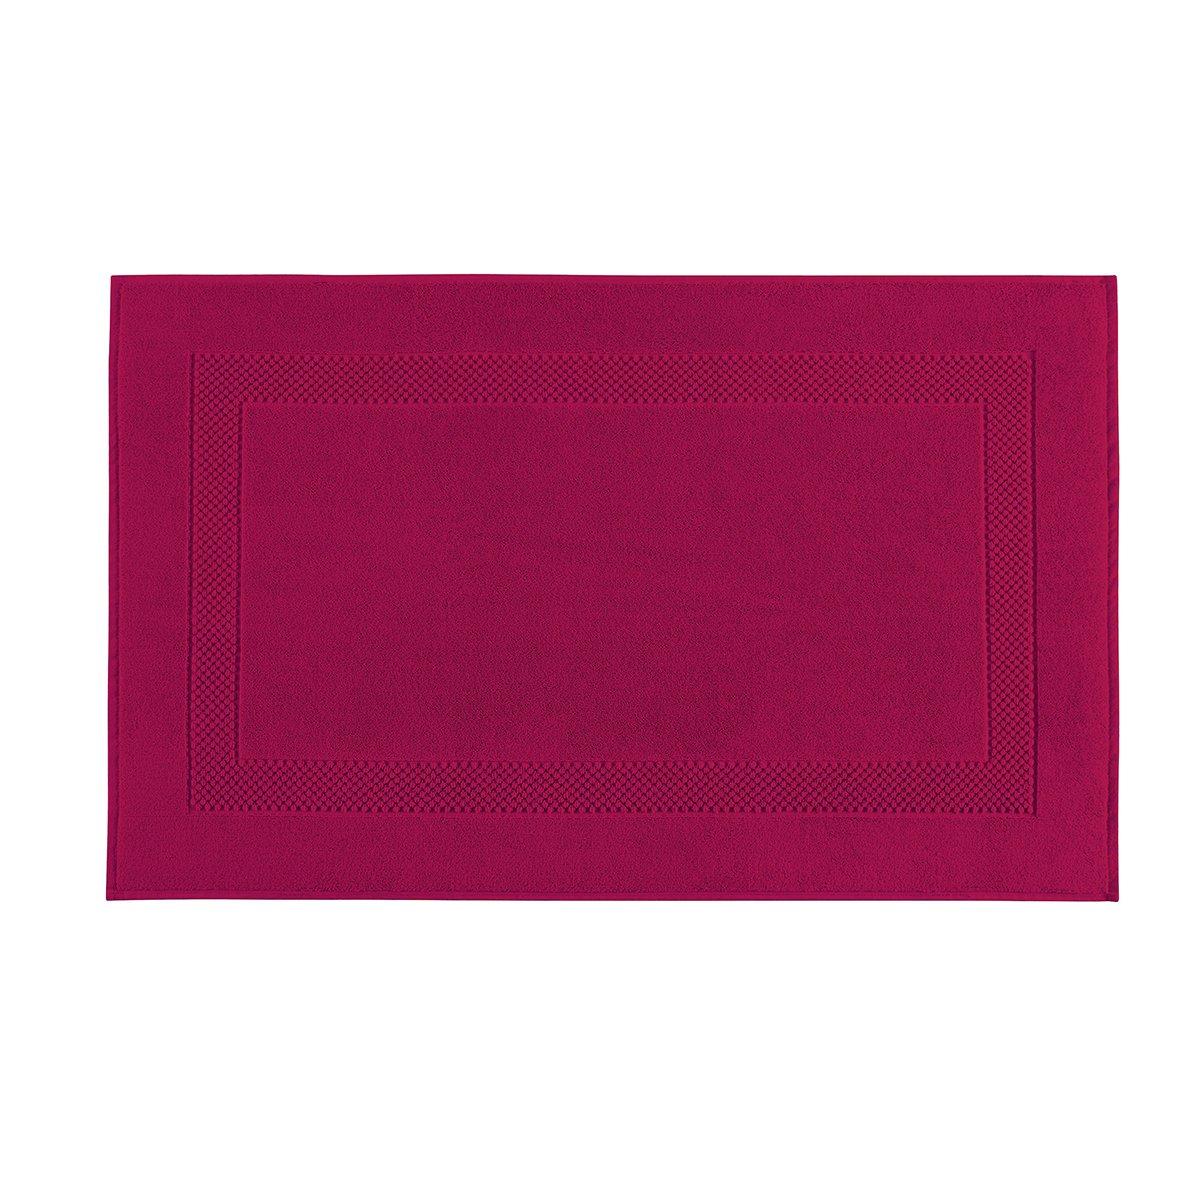 Tapis de bain coton 60x80 cm fuchsia